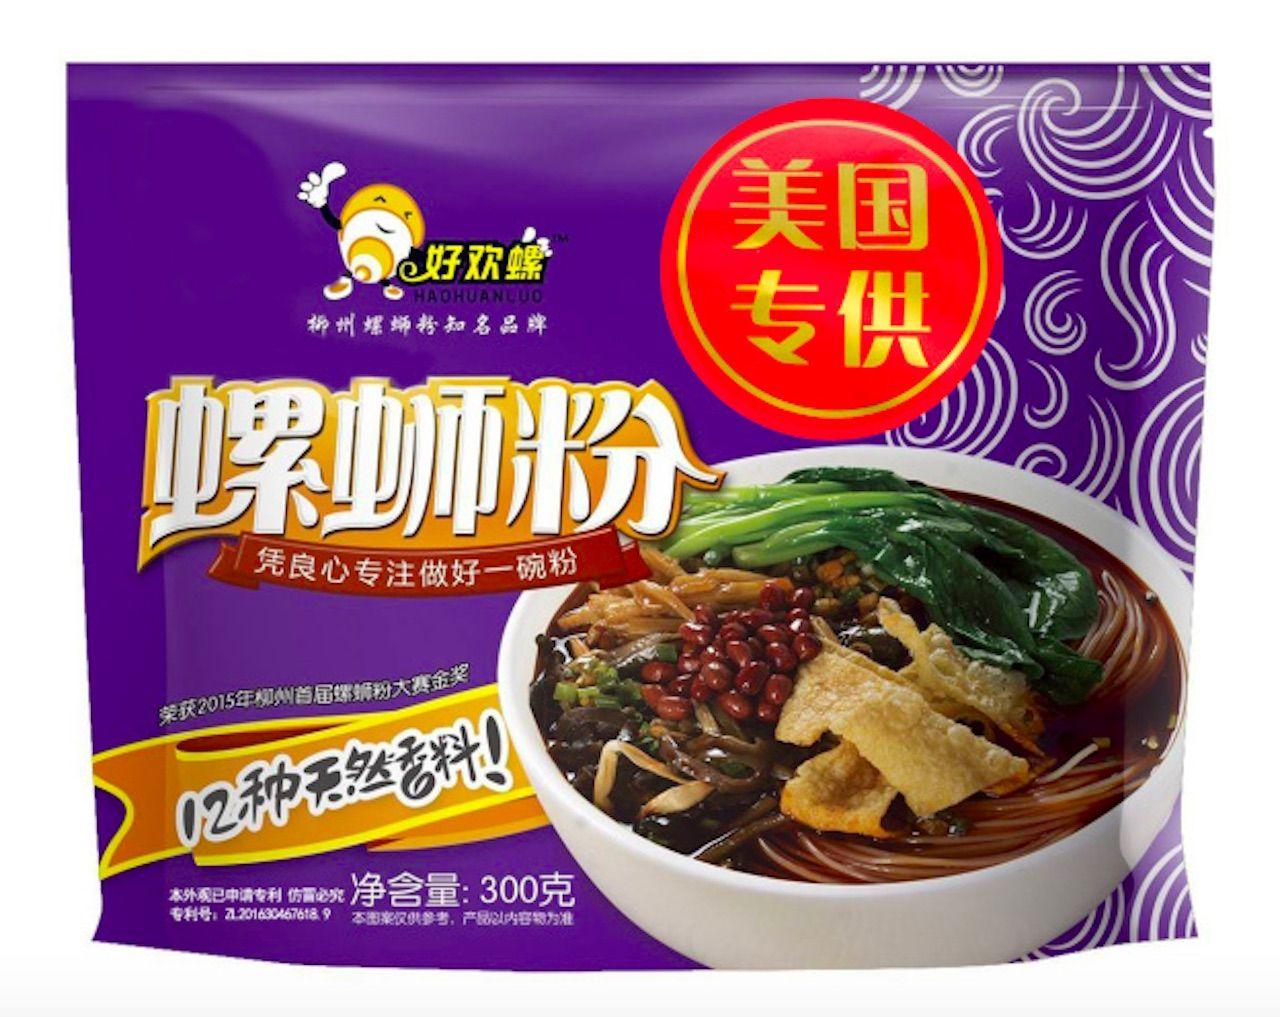 HAOHUANLUO instant noodles